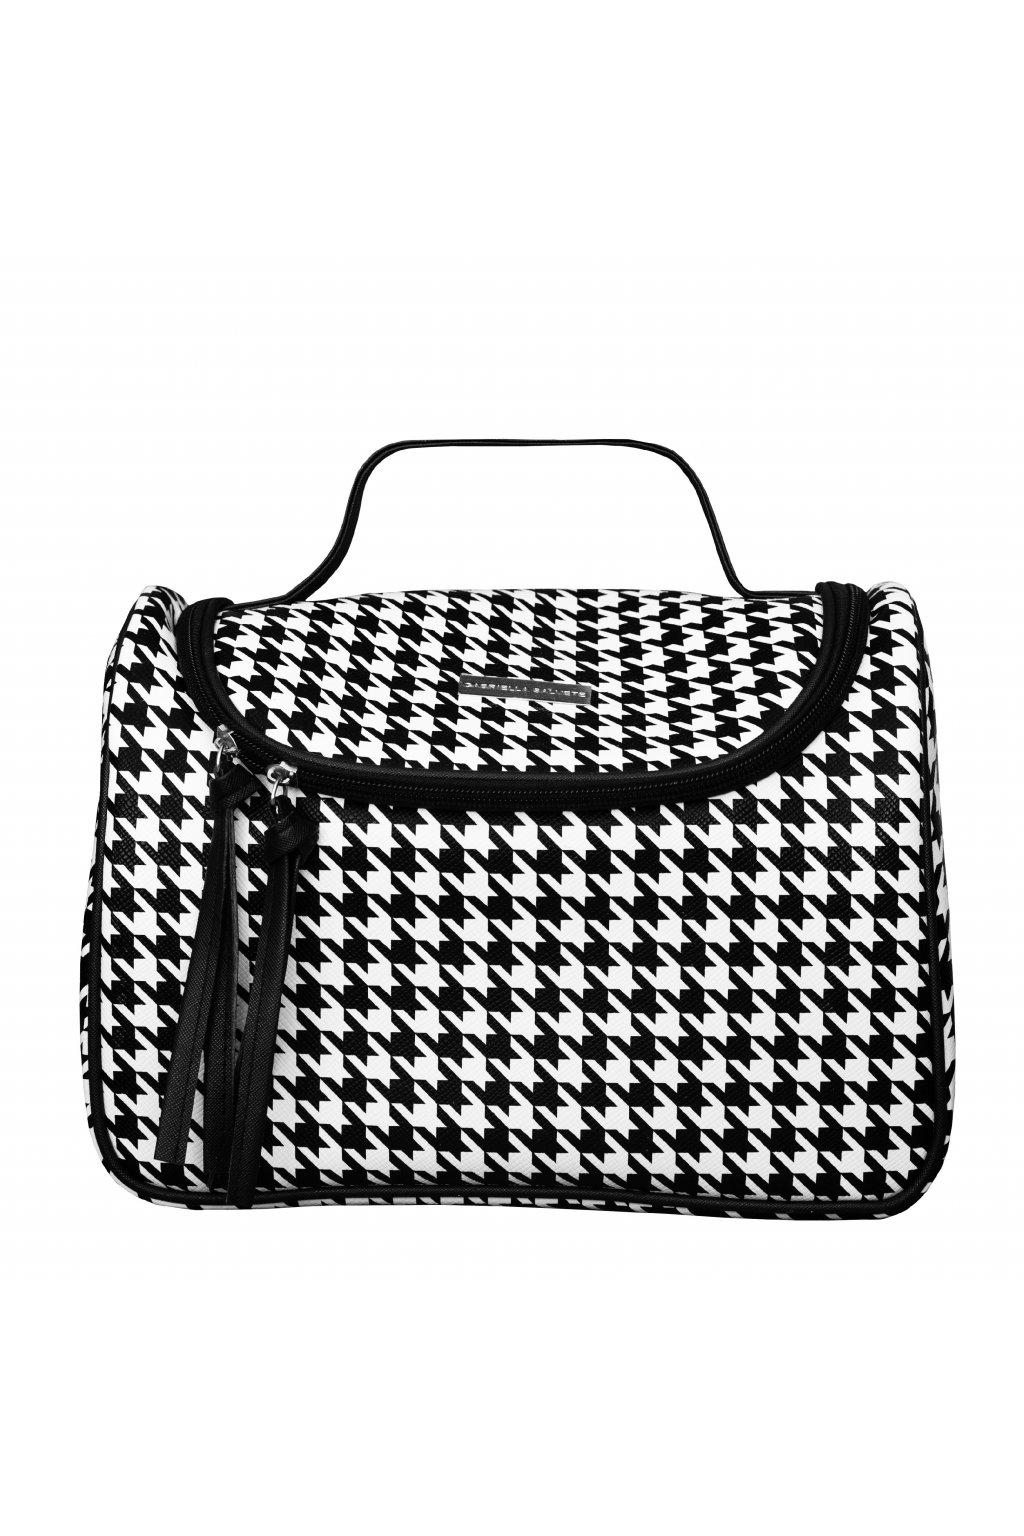 gabriella salvete kosmeticka taska cosmetic bag no 4